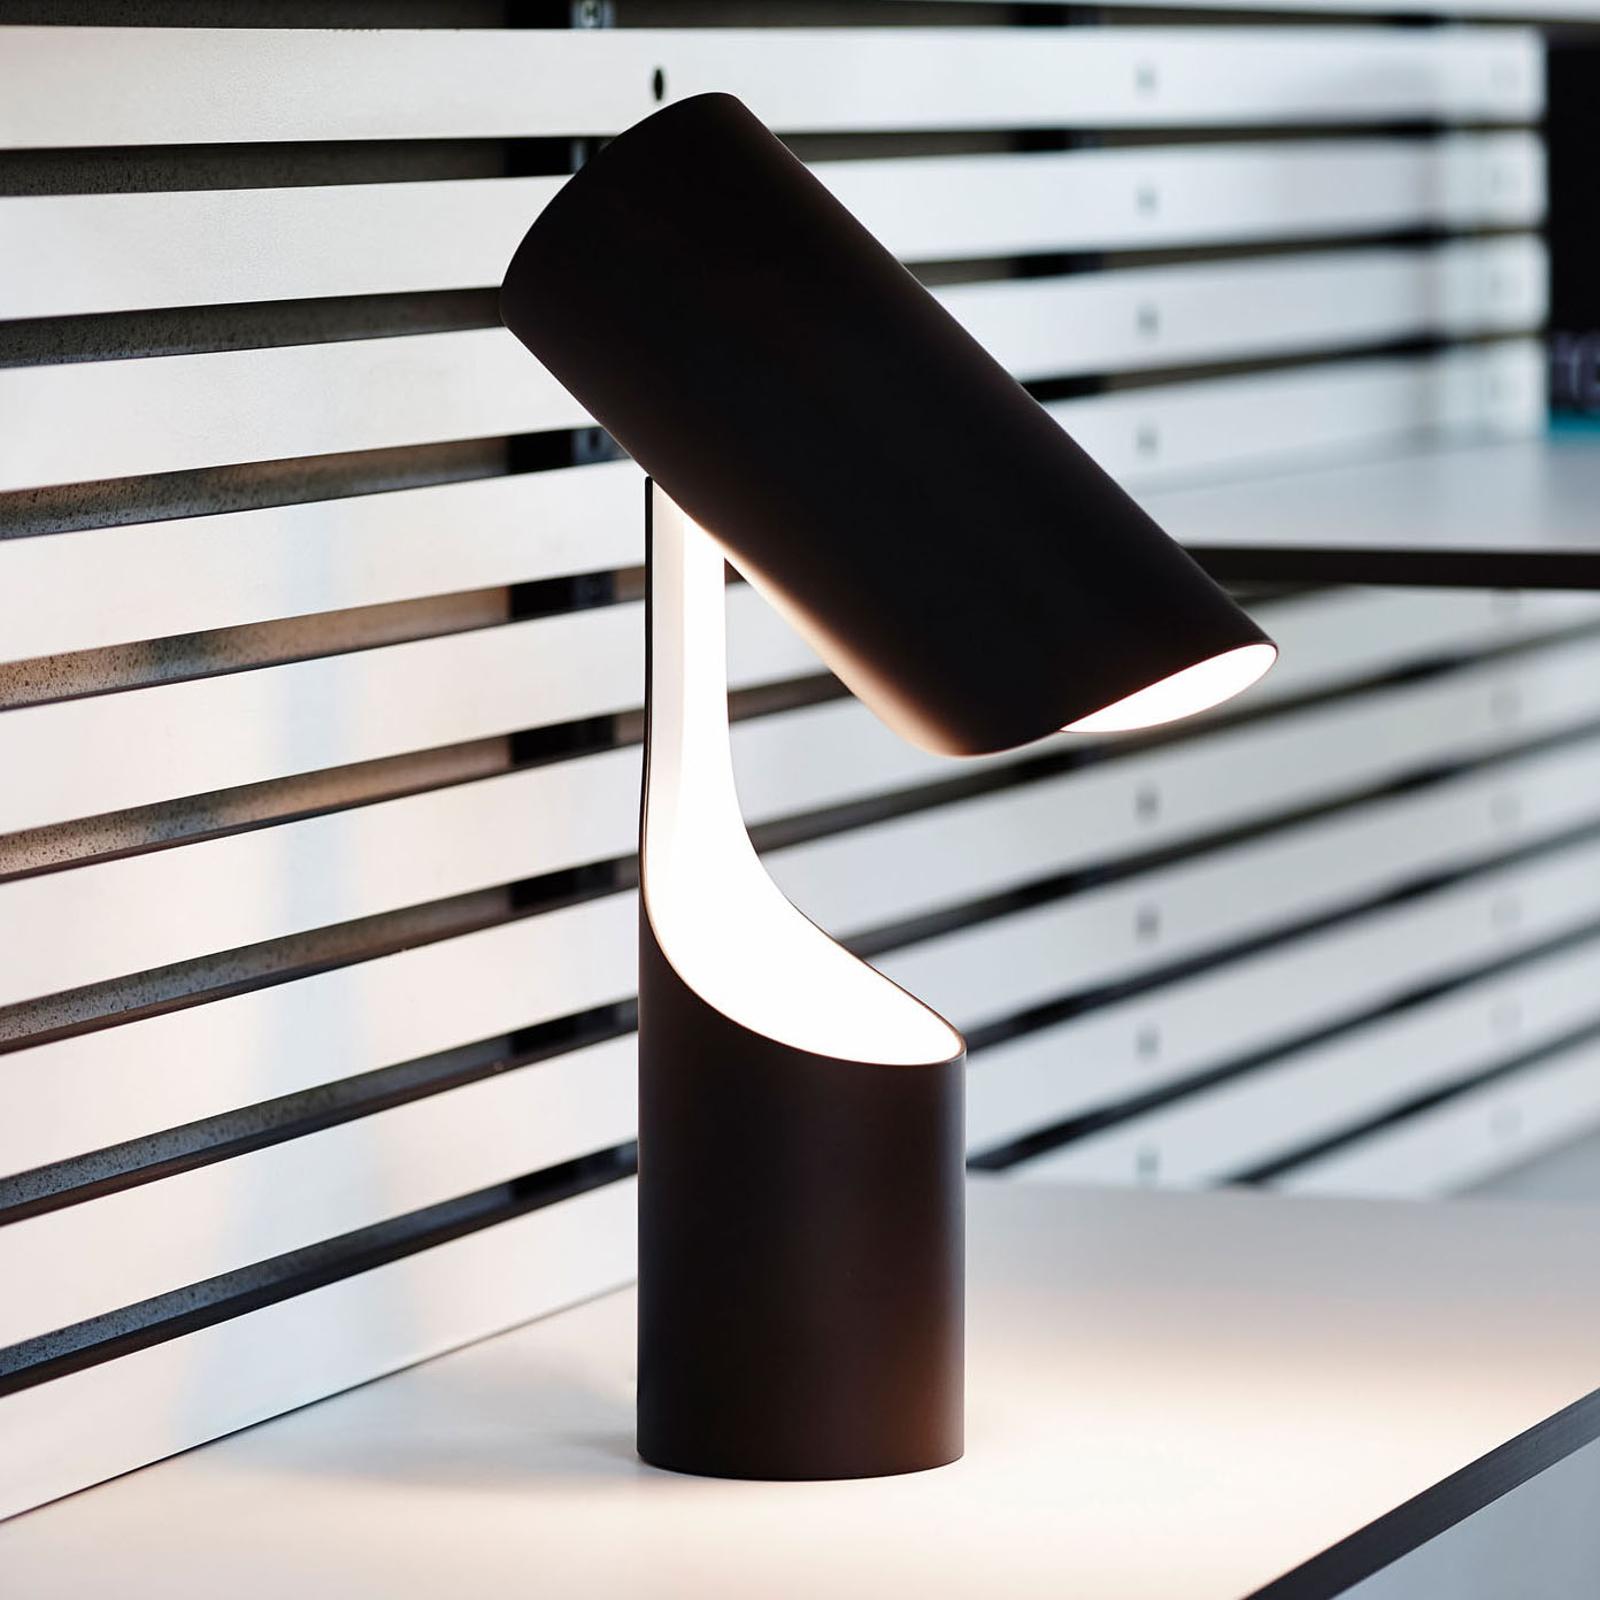 LE KLINT Mutatio stolní lampa, E14, černá/bílá